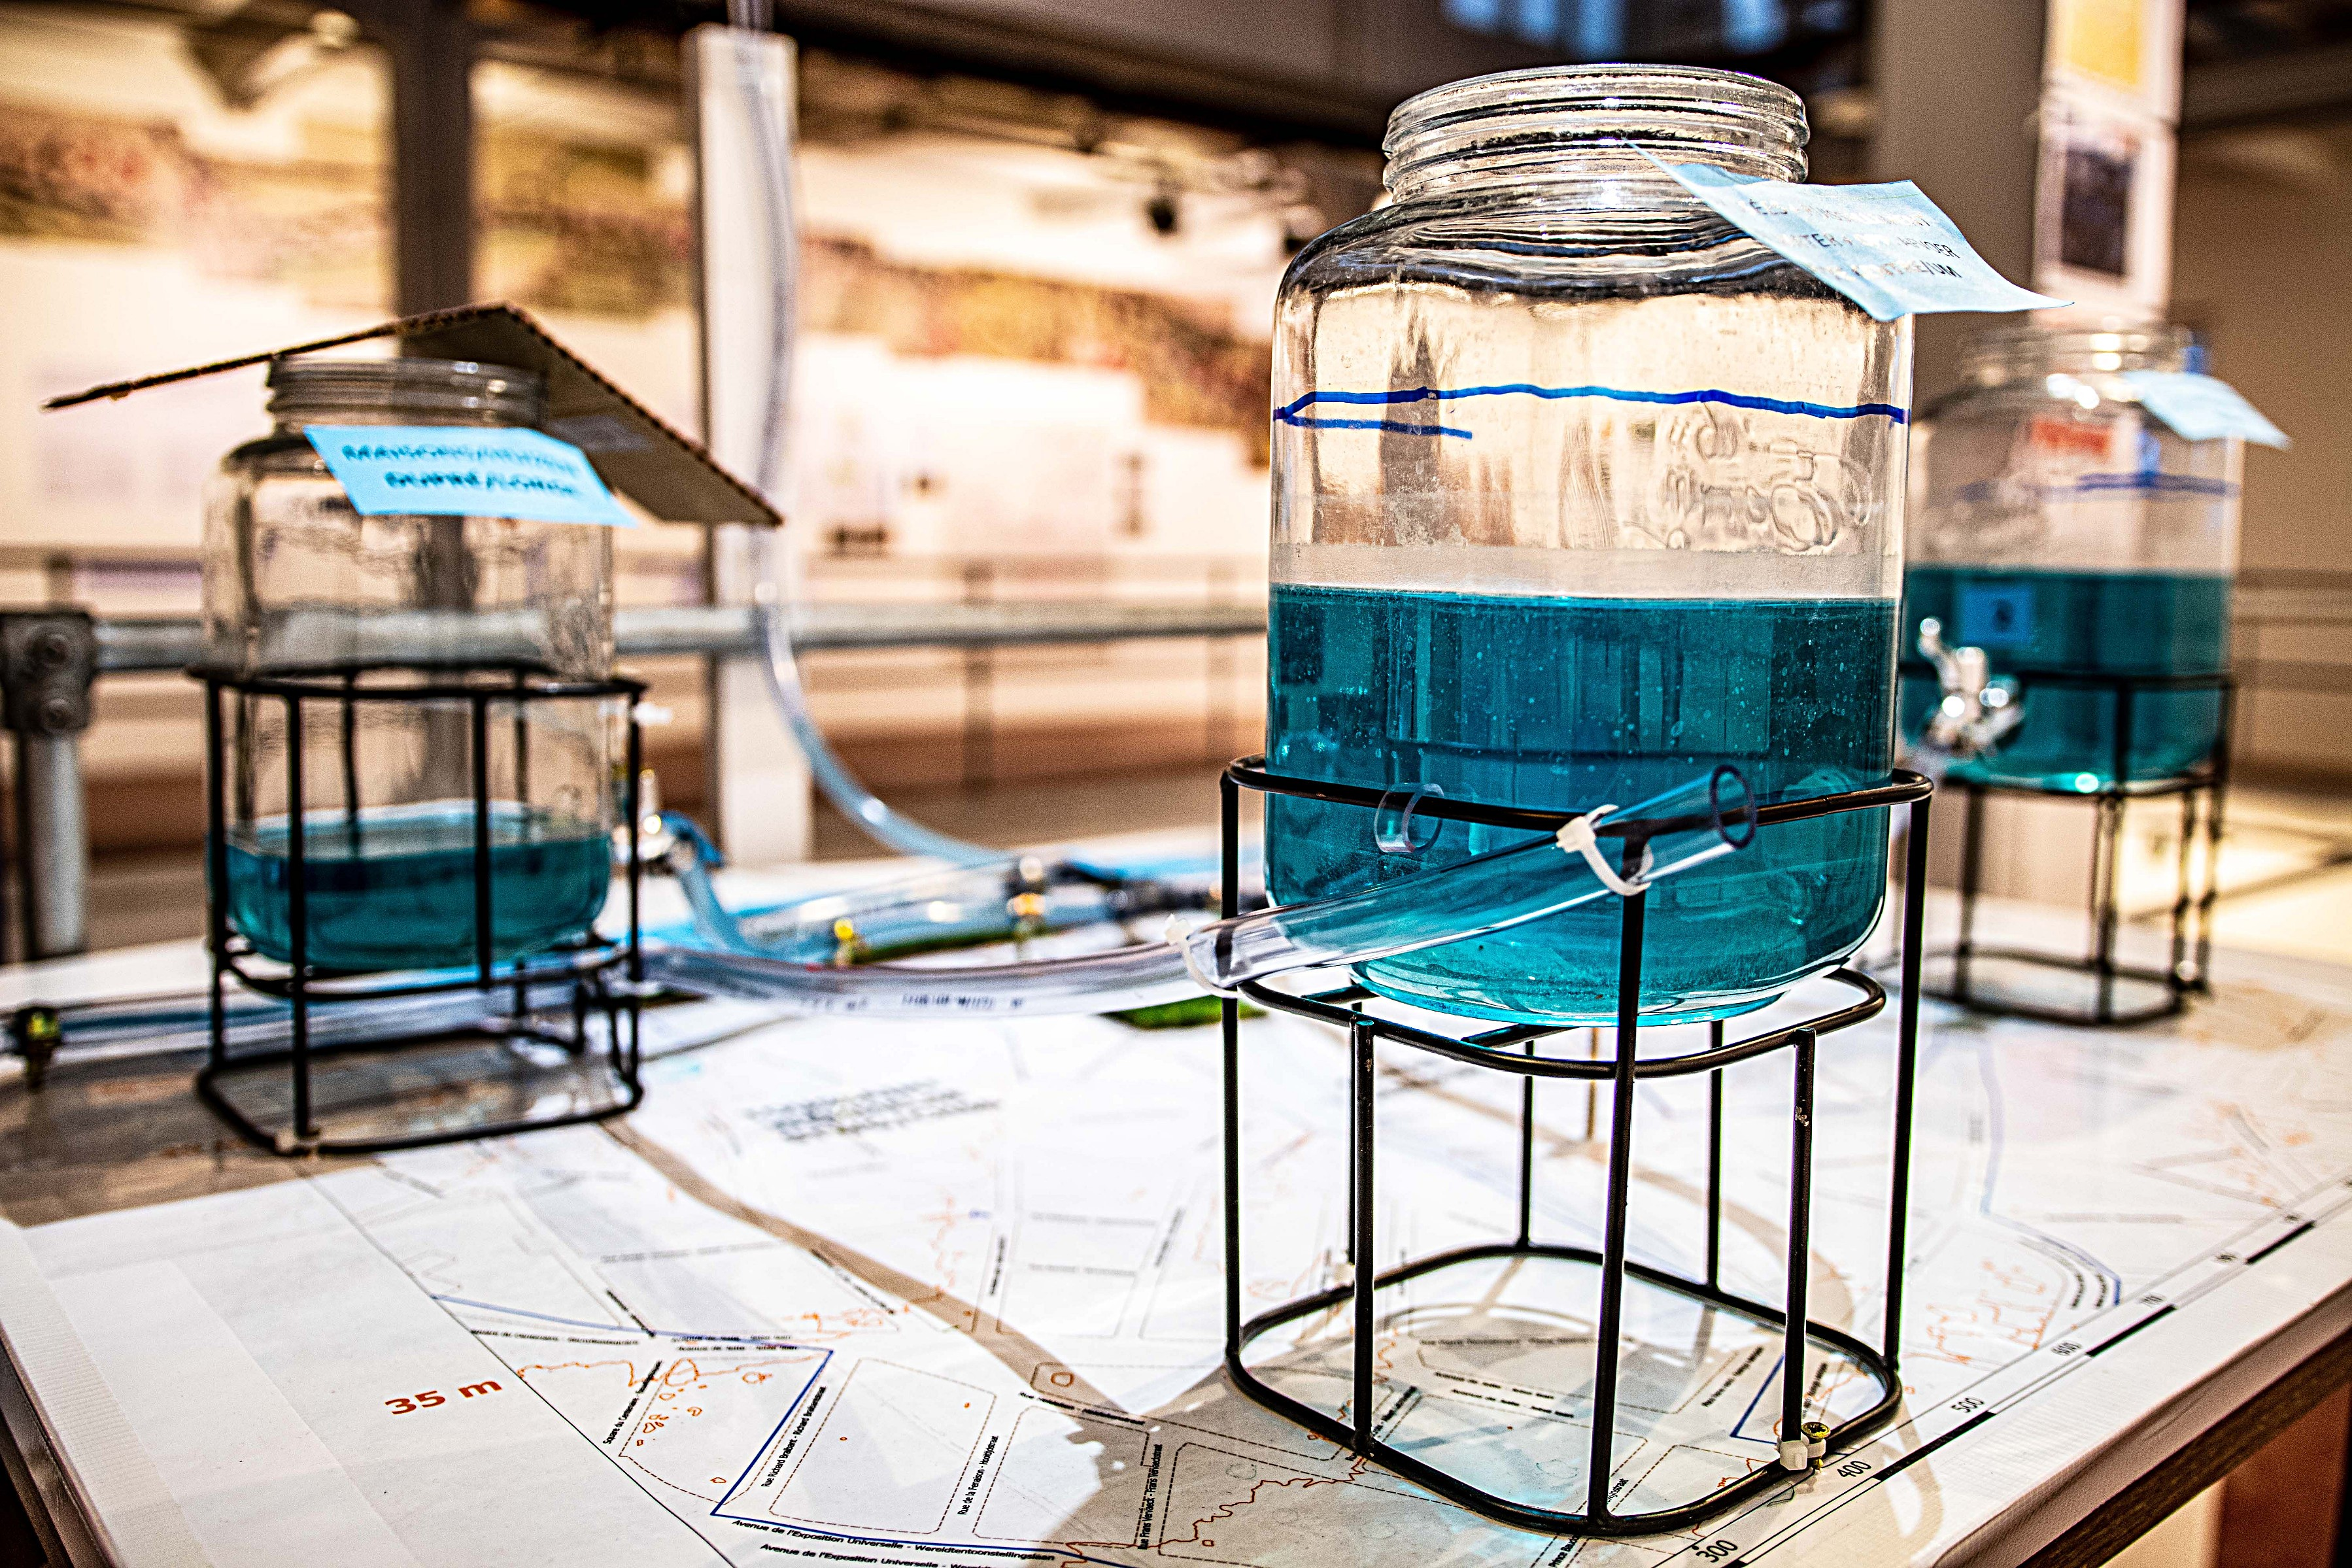 22 mars > 24 avril - Expo 'Bruxelles sensible à l'eau'